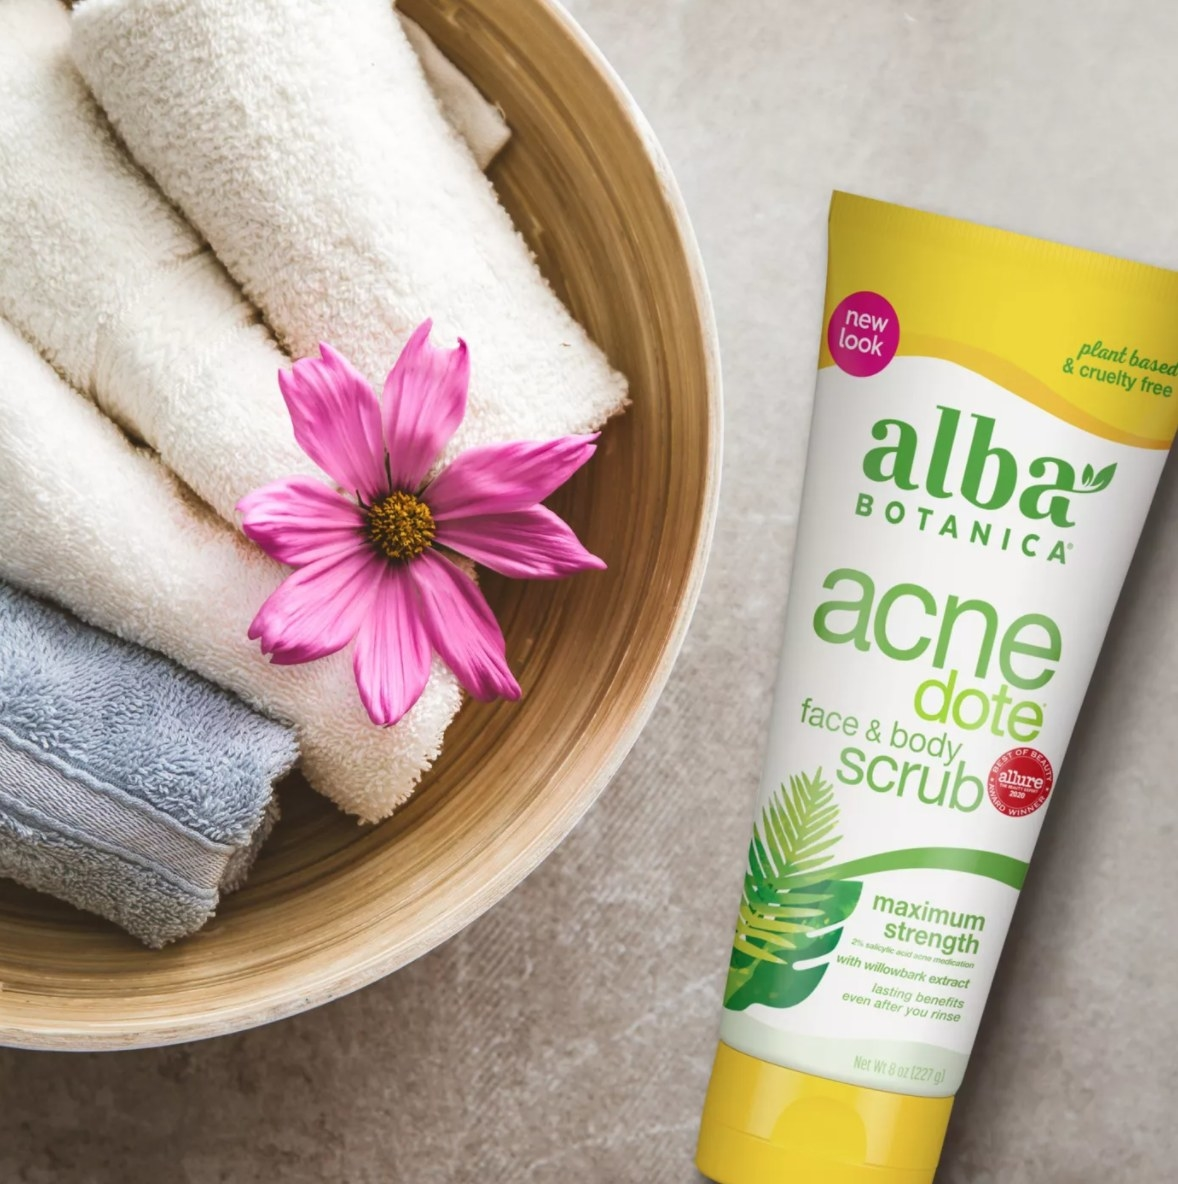 Tube of Alba botanica scrub next to towels